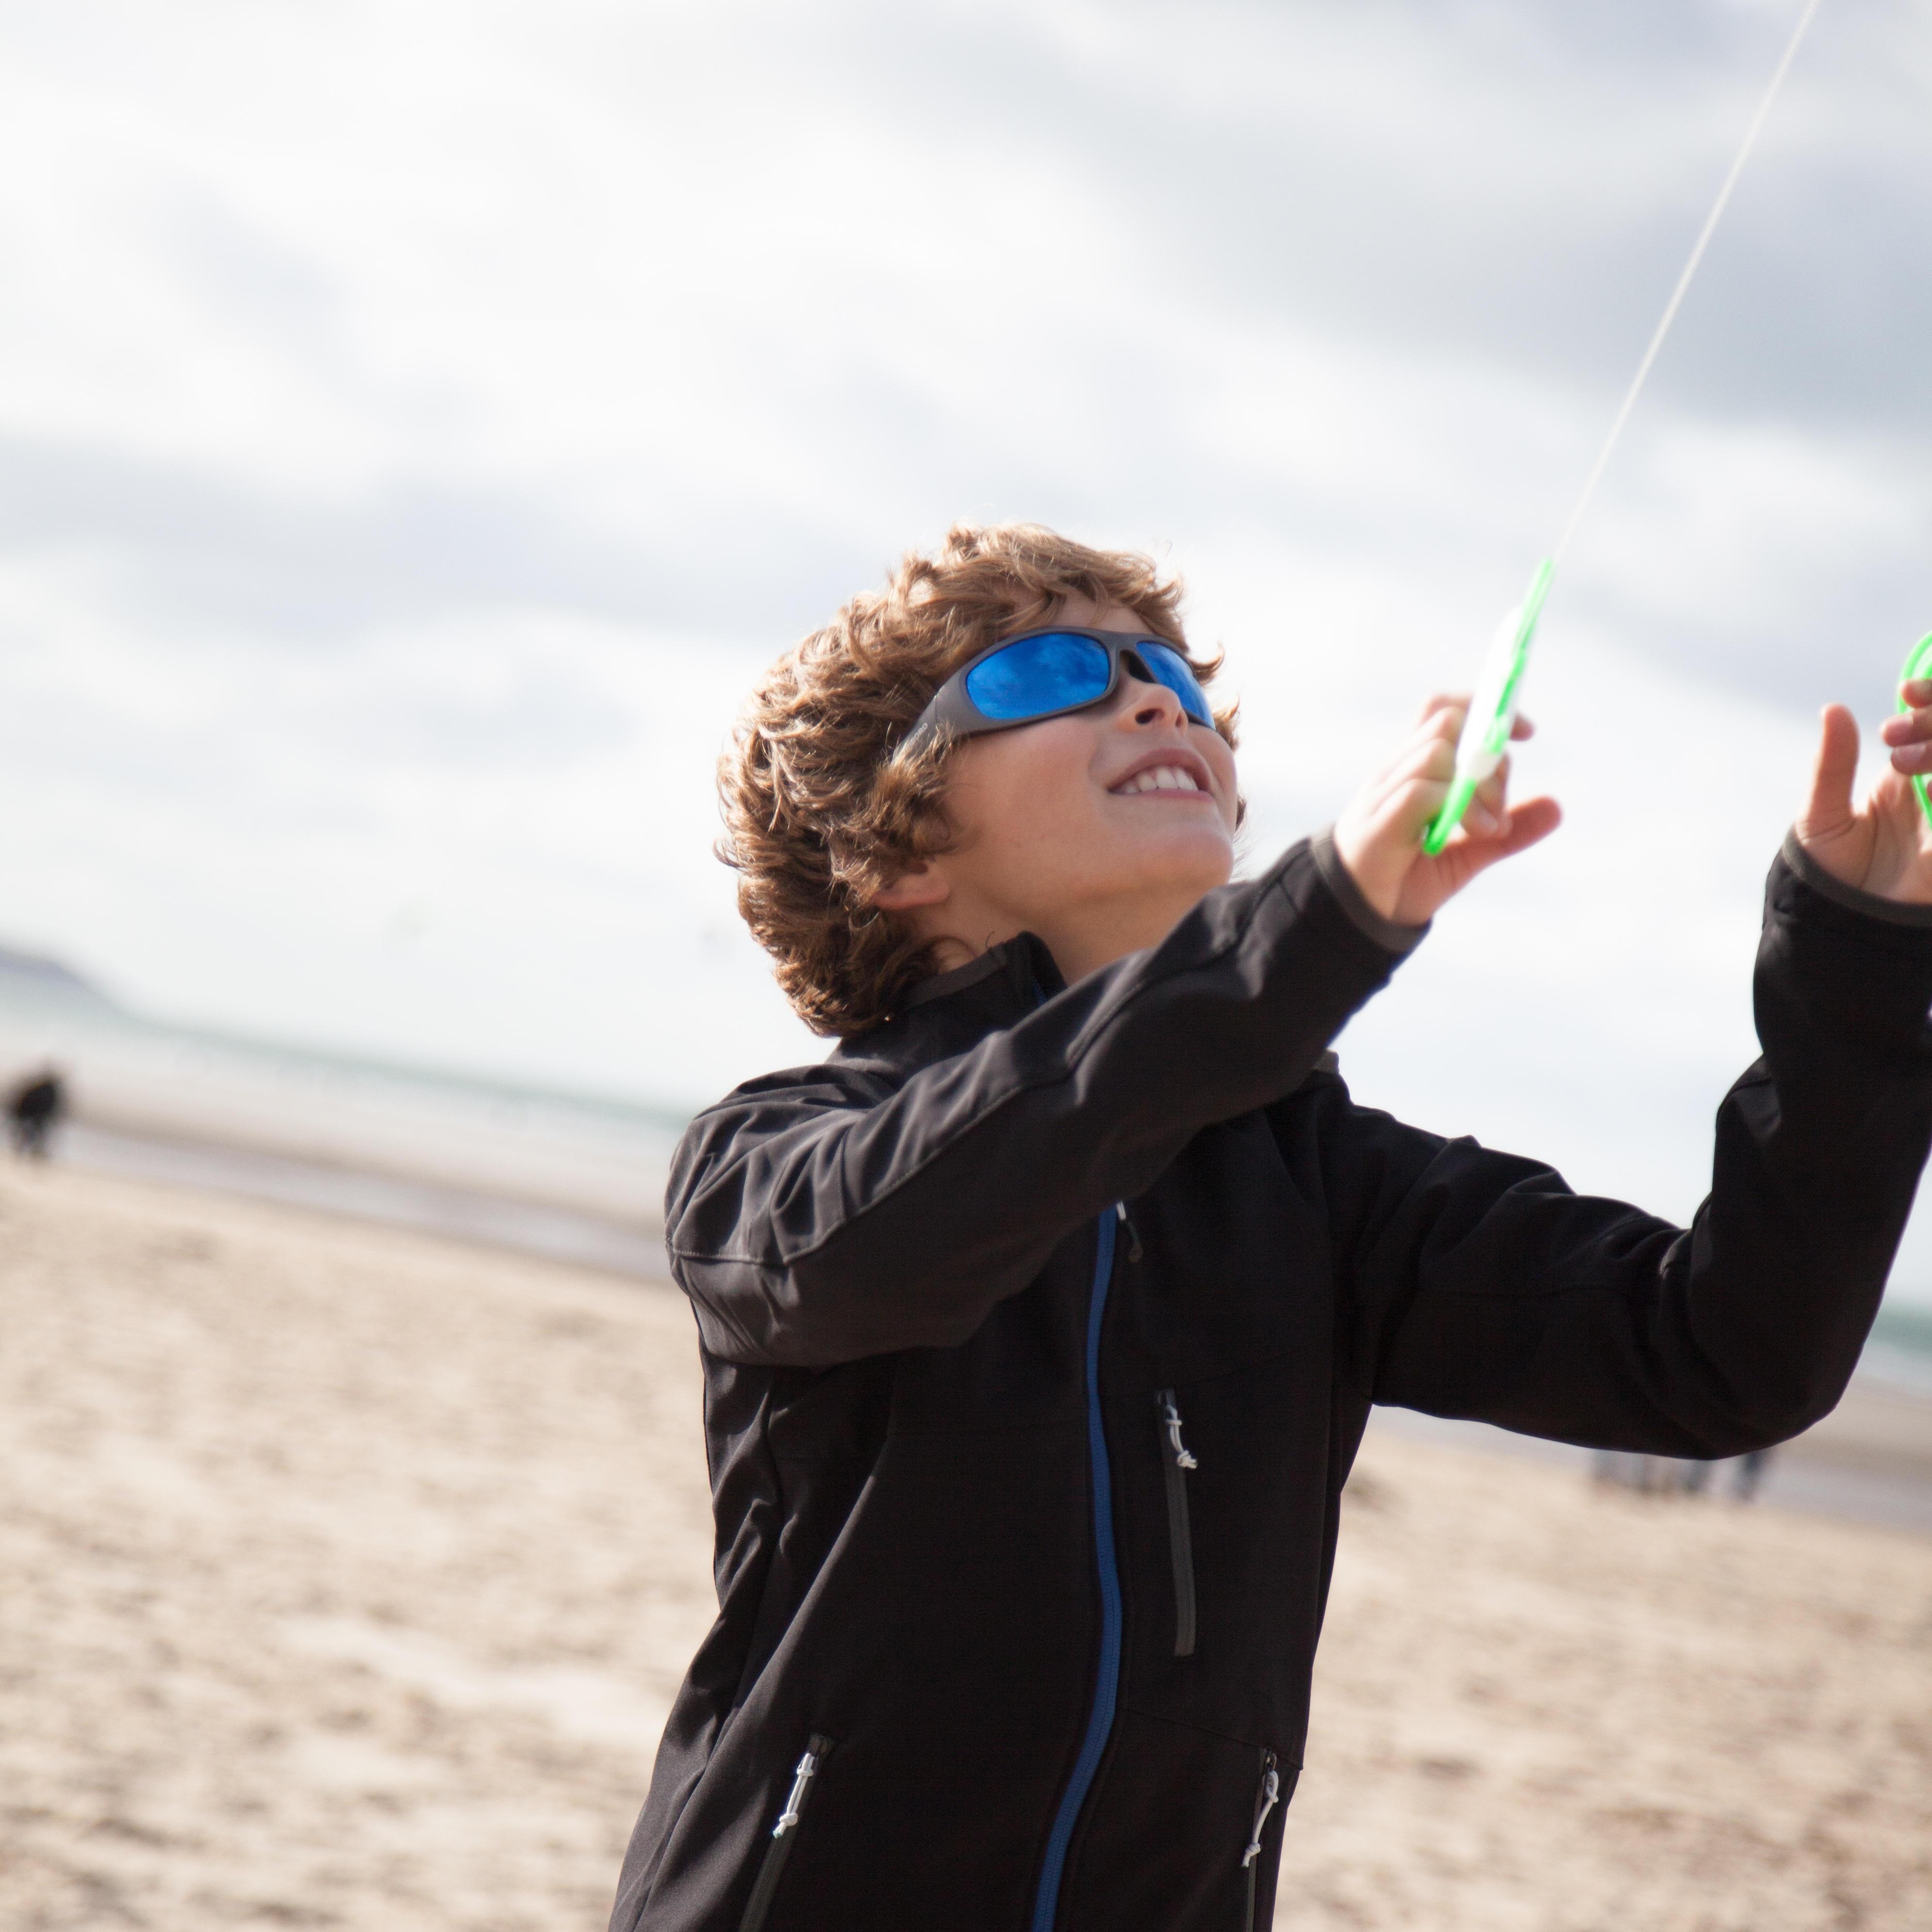 Izypilot 100 2-in-1 Progressive Kite (Stunt _INF_-_SUP_ Static)